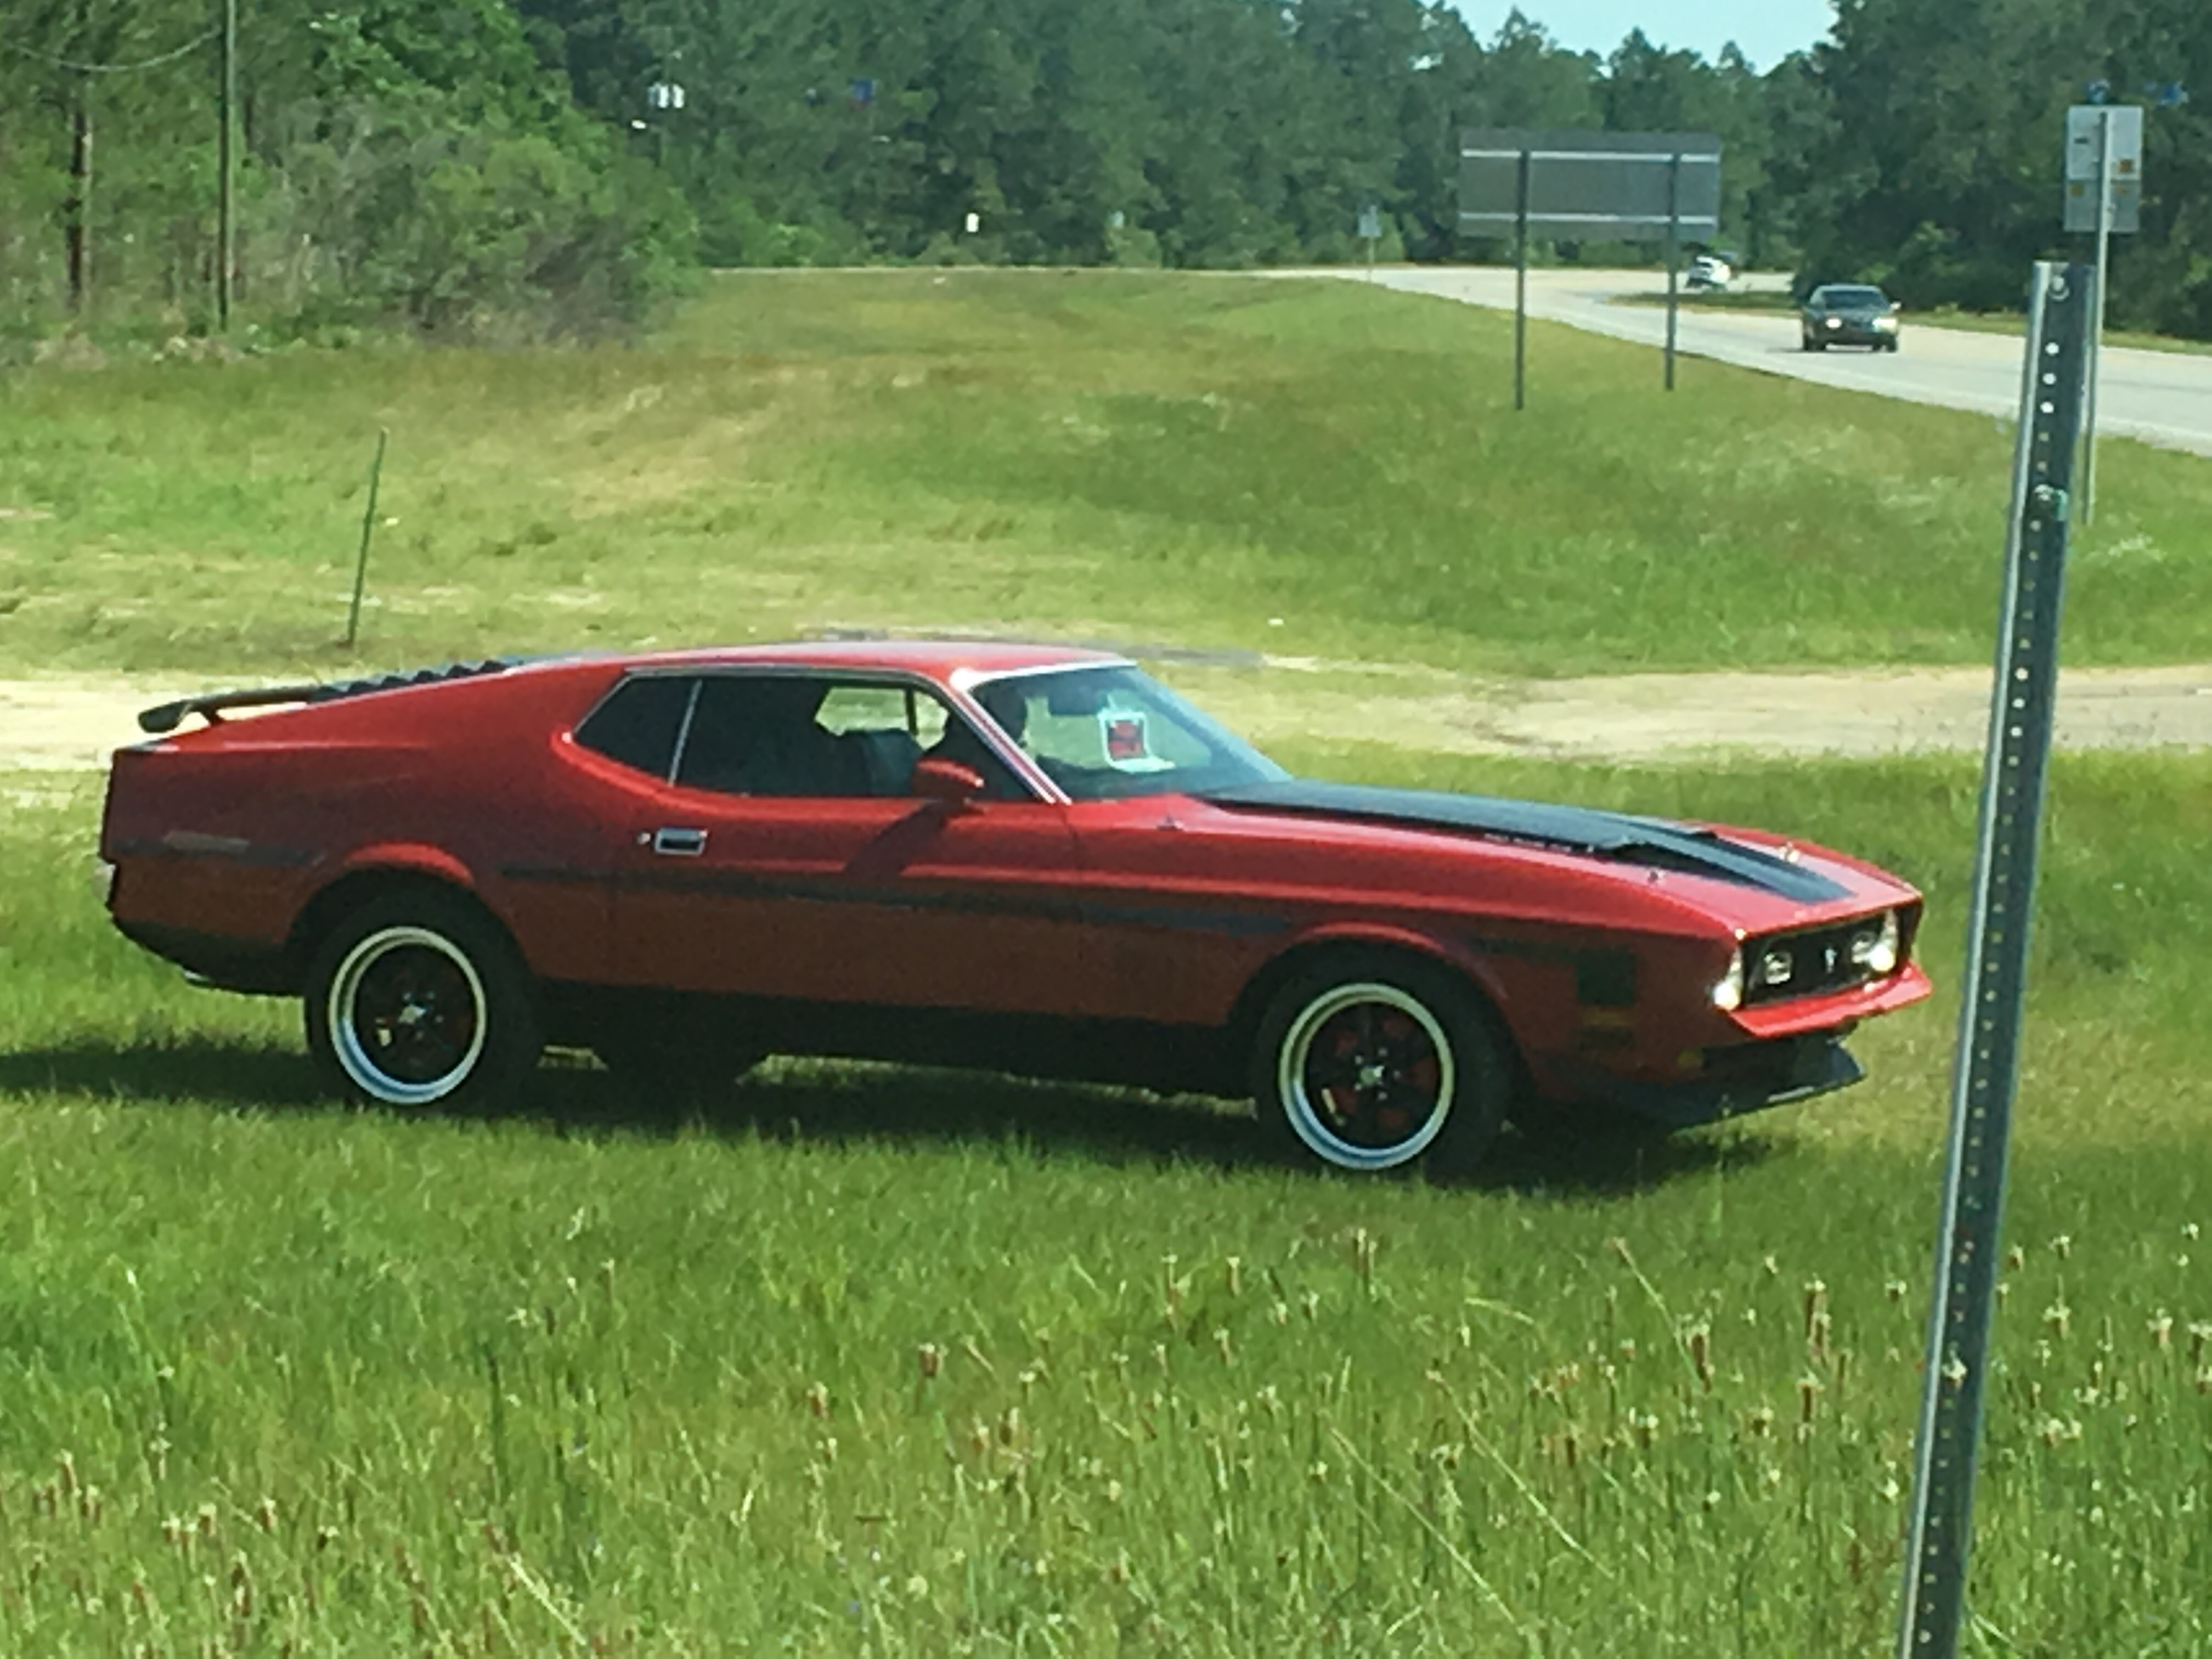 79 Mustang